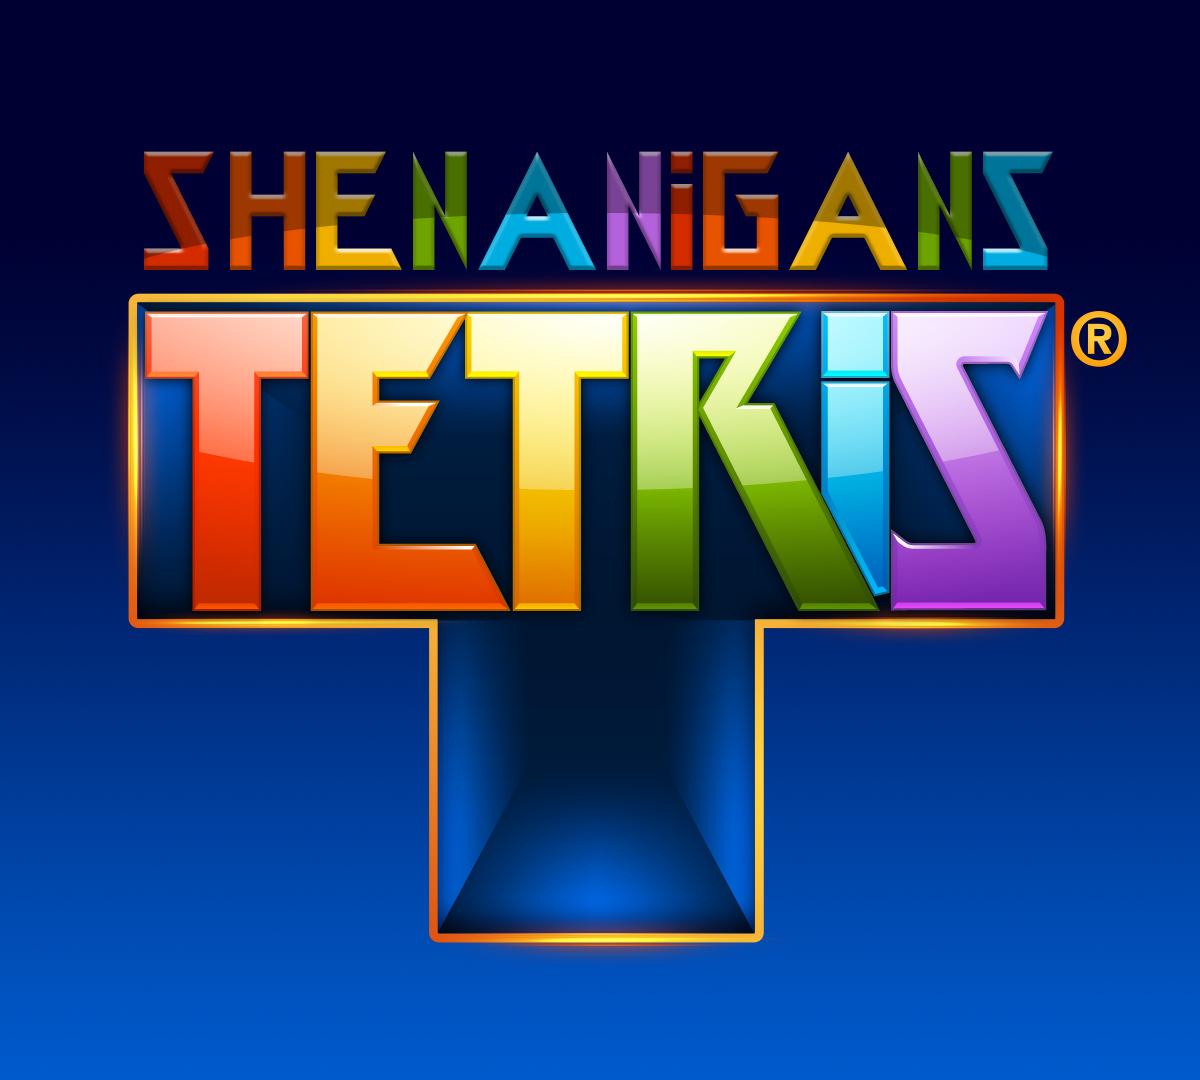 Tetris Shenanigans FONDO.png